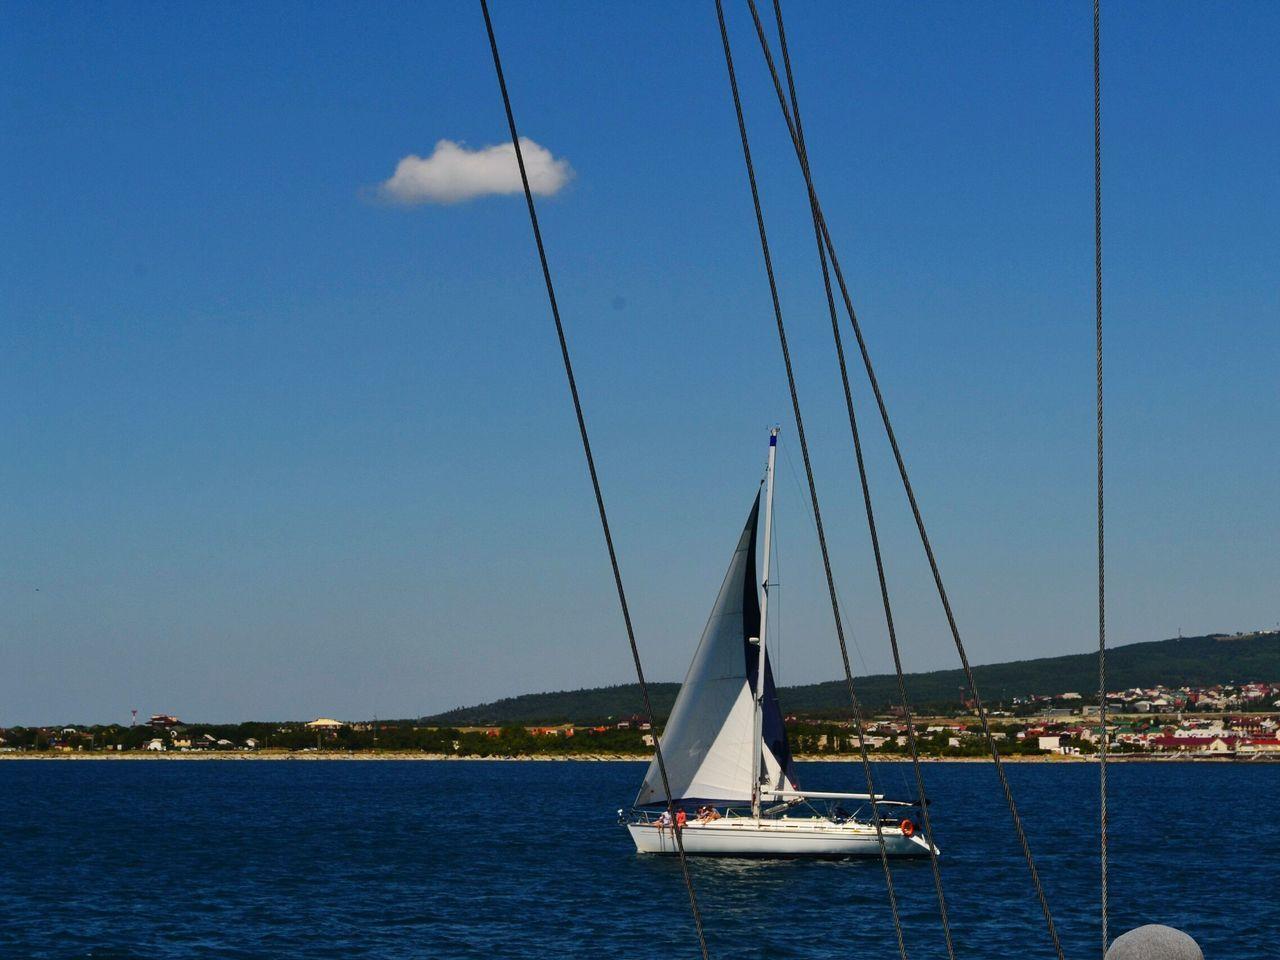 Море Черное море катер красиво Lieblingsteil